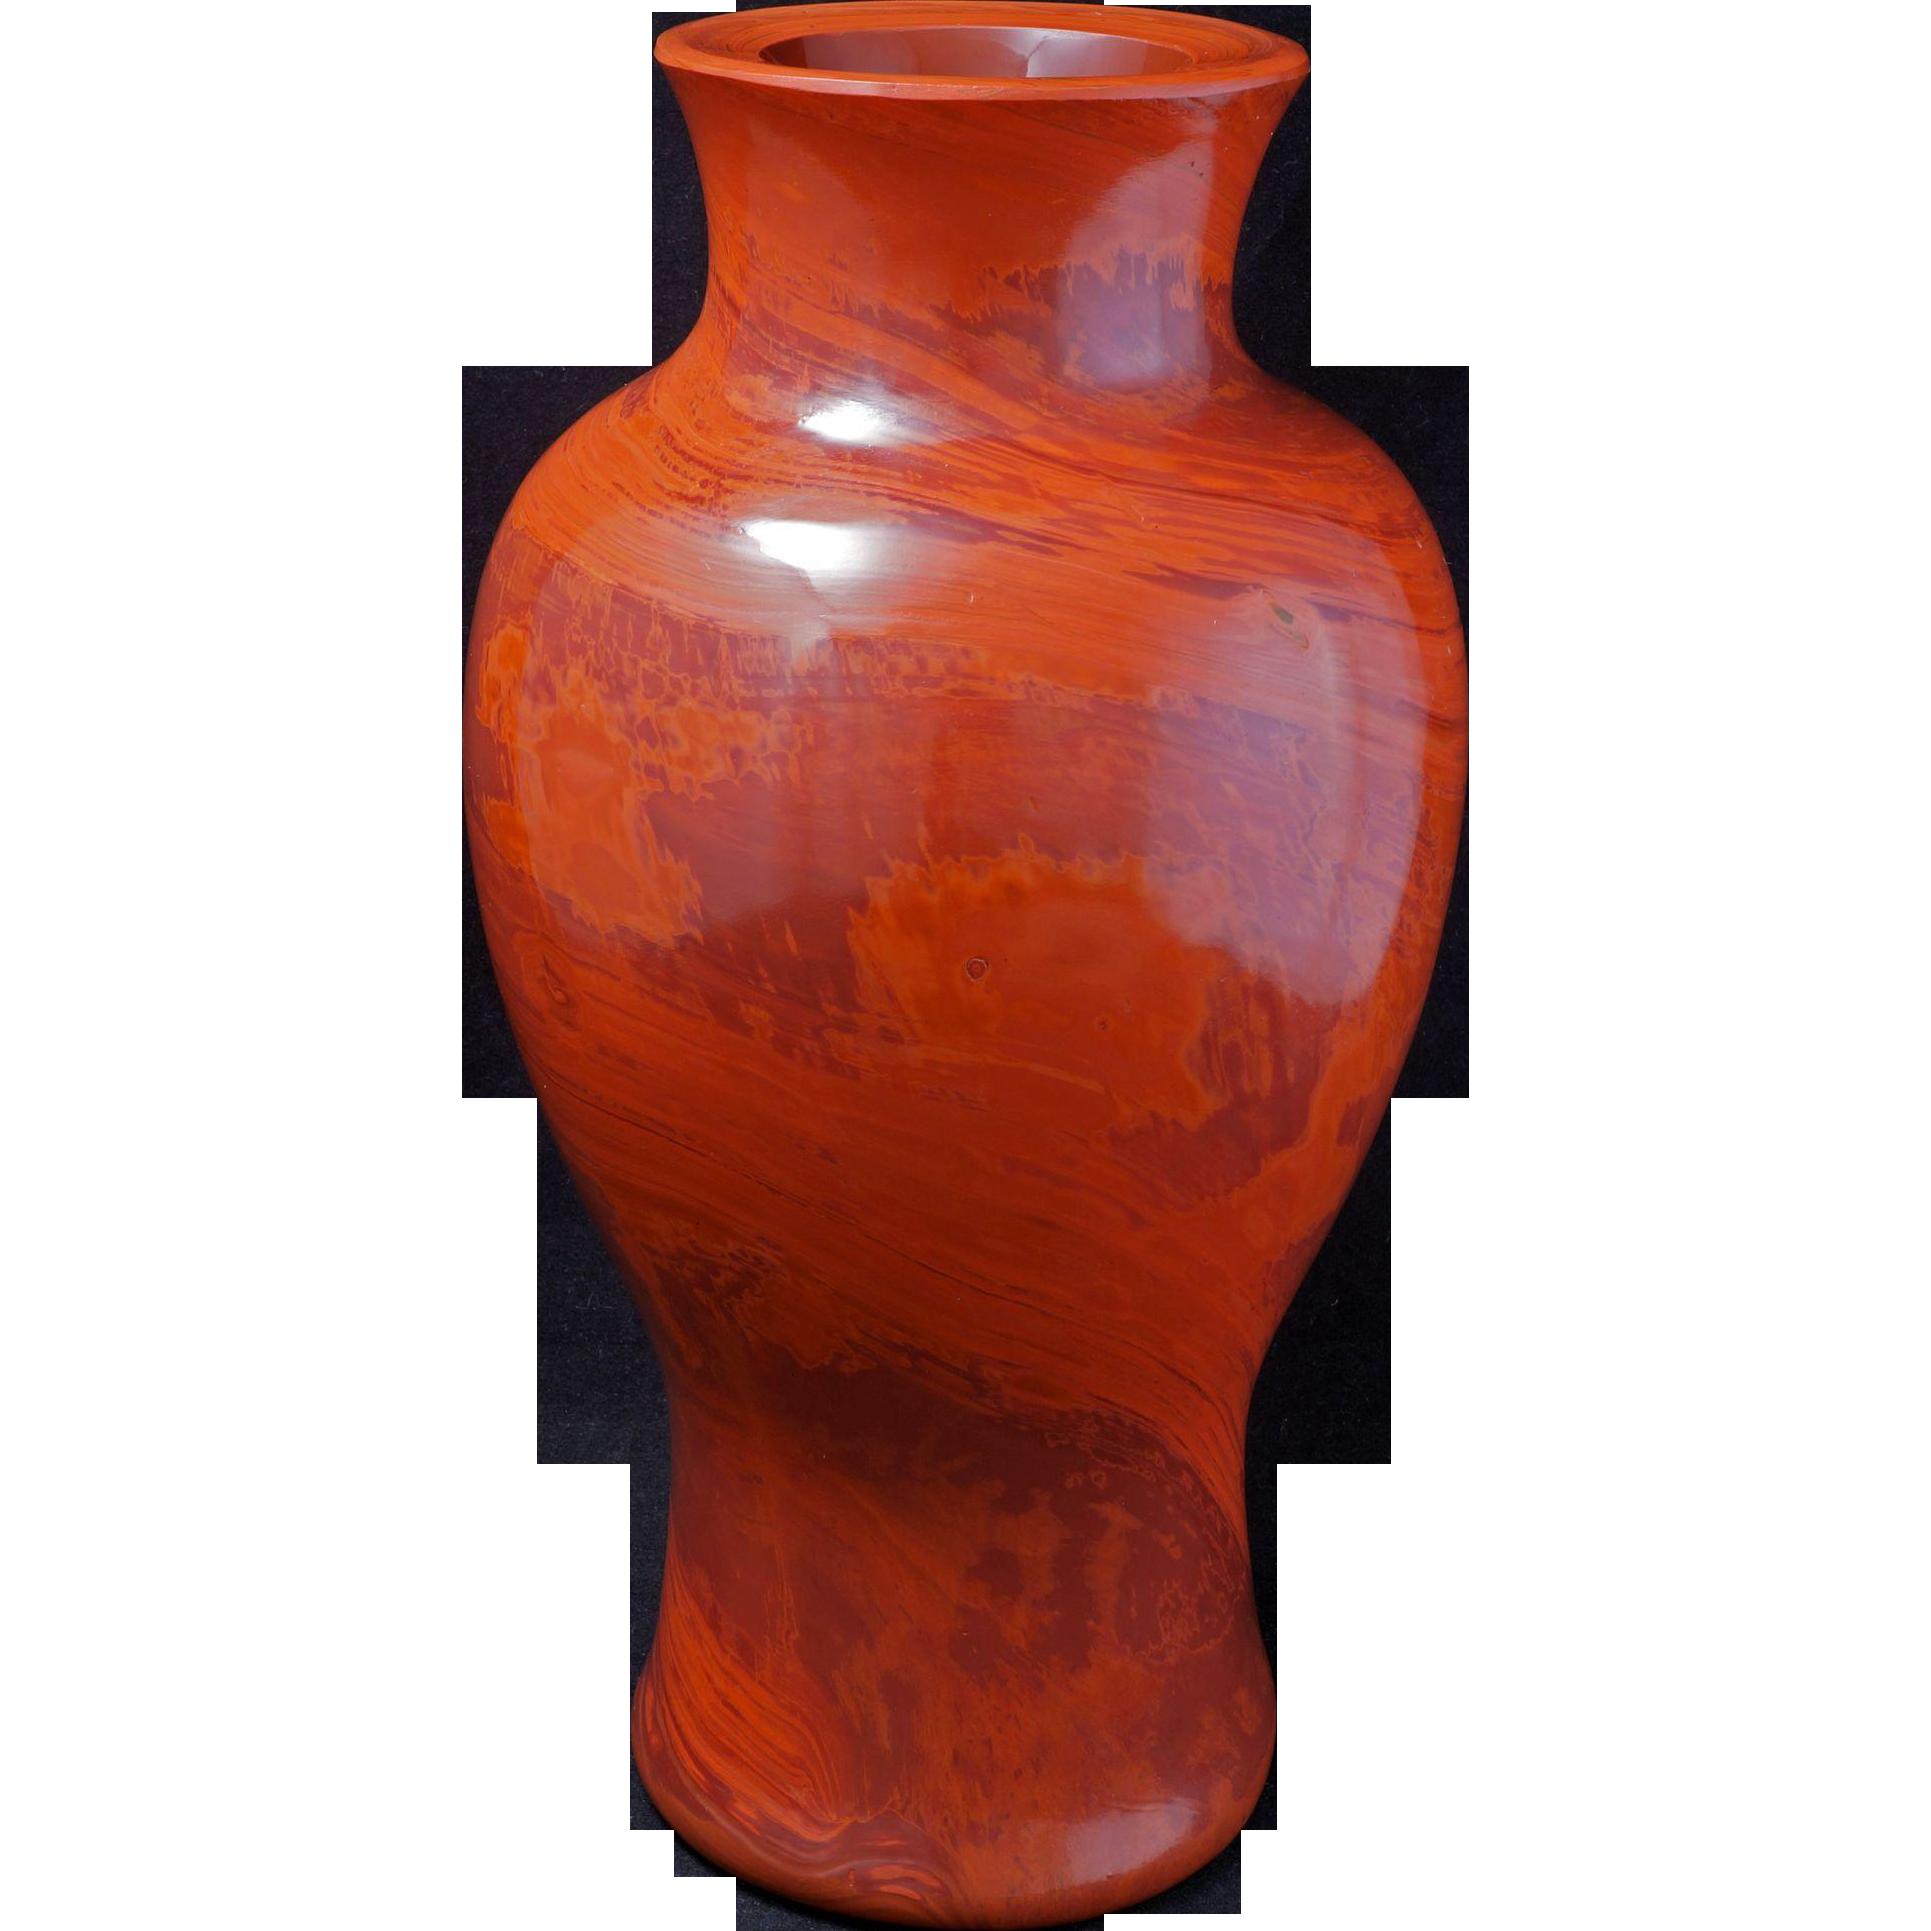 50 elegant vase shapes home idea urn shaped chinese realgar peking glass vase late 19th reviewsmspy